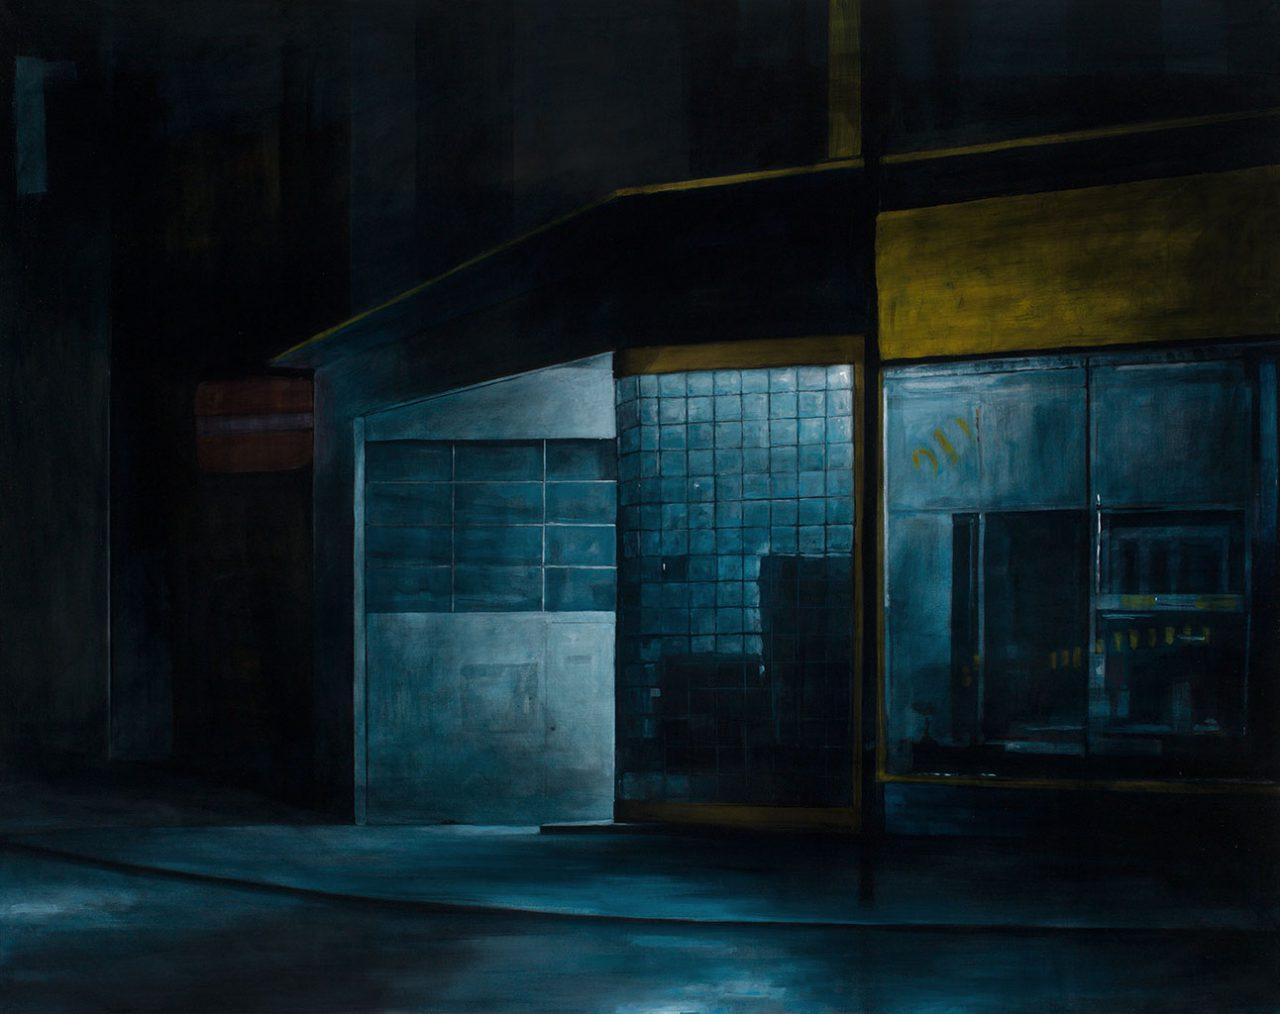 nachttanke, 2016, öl/leinwand, 150 x 190 cm